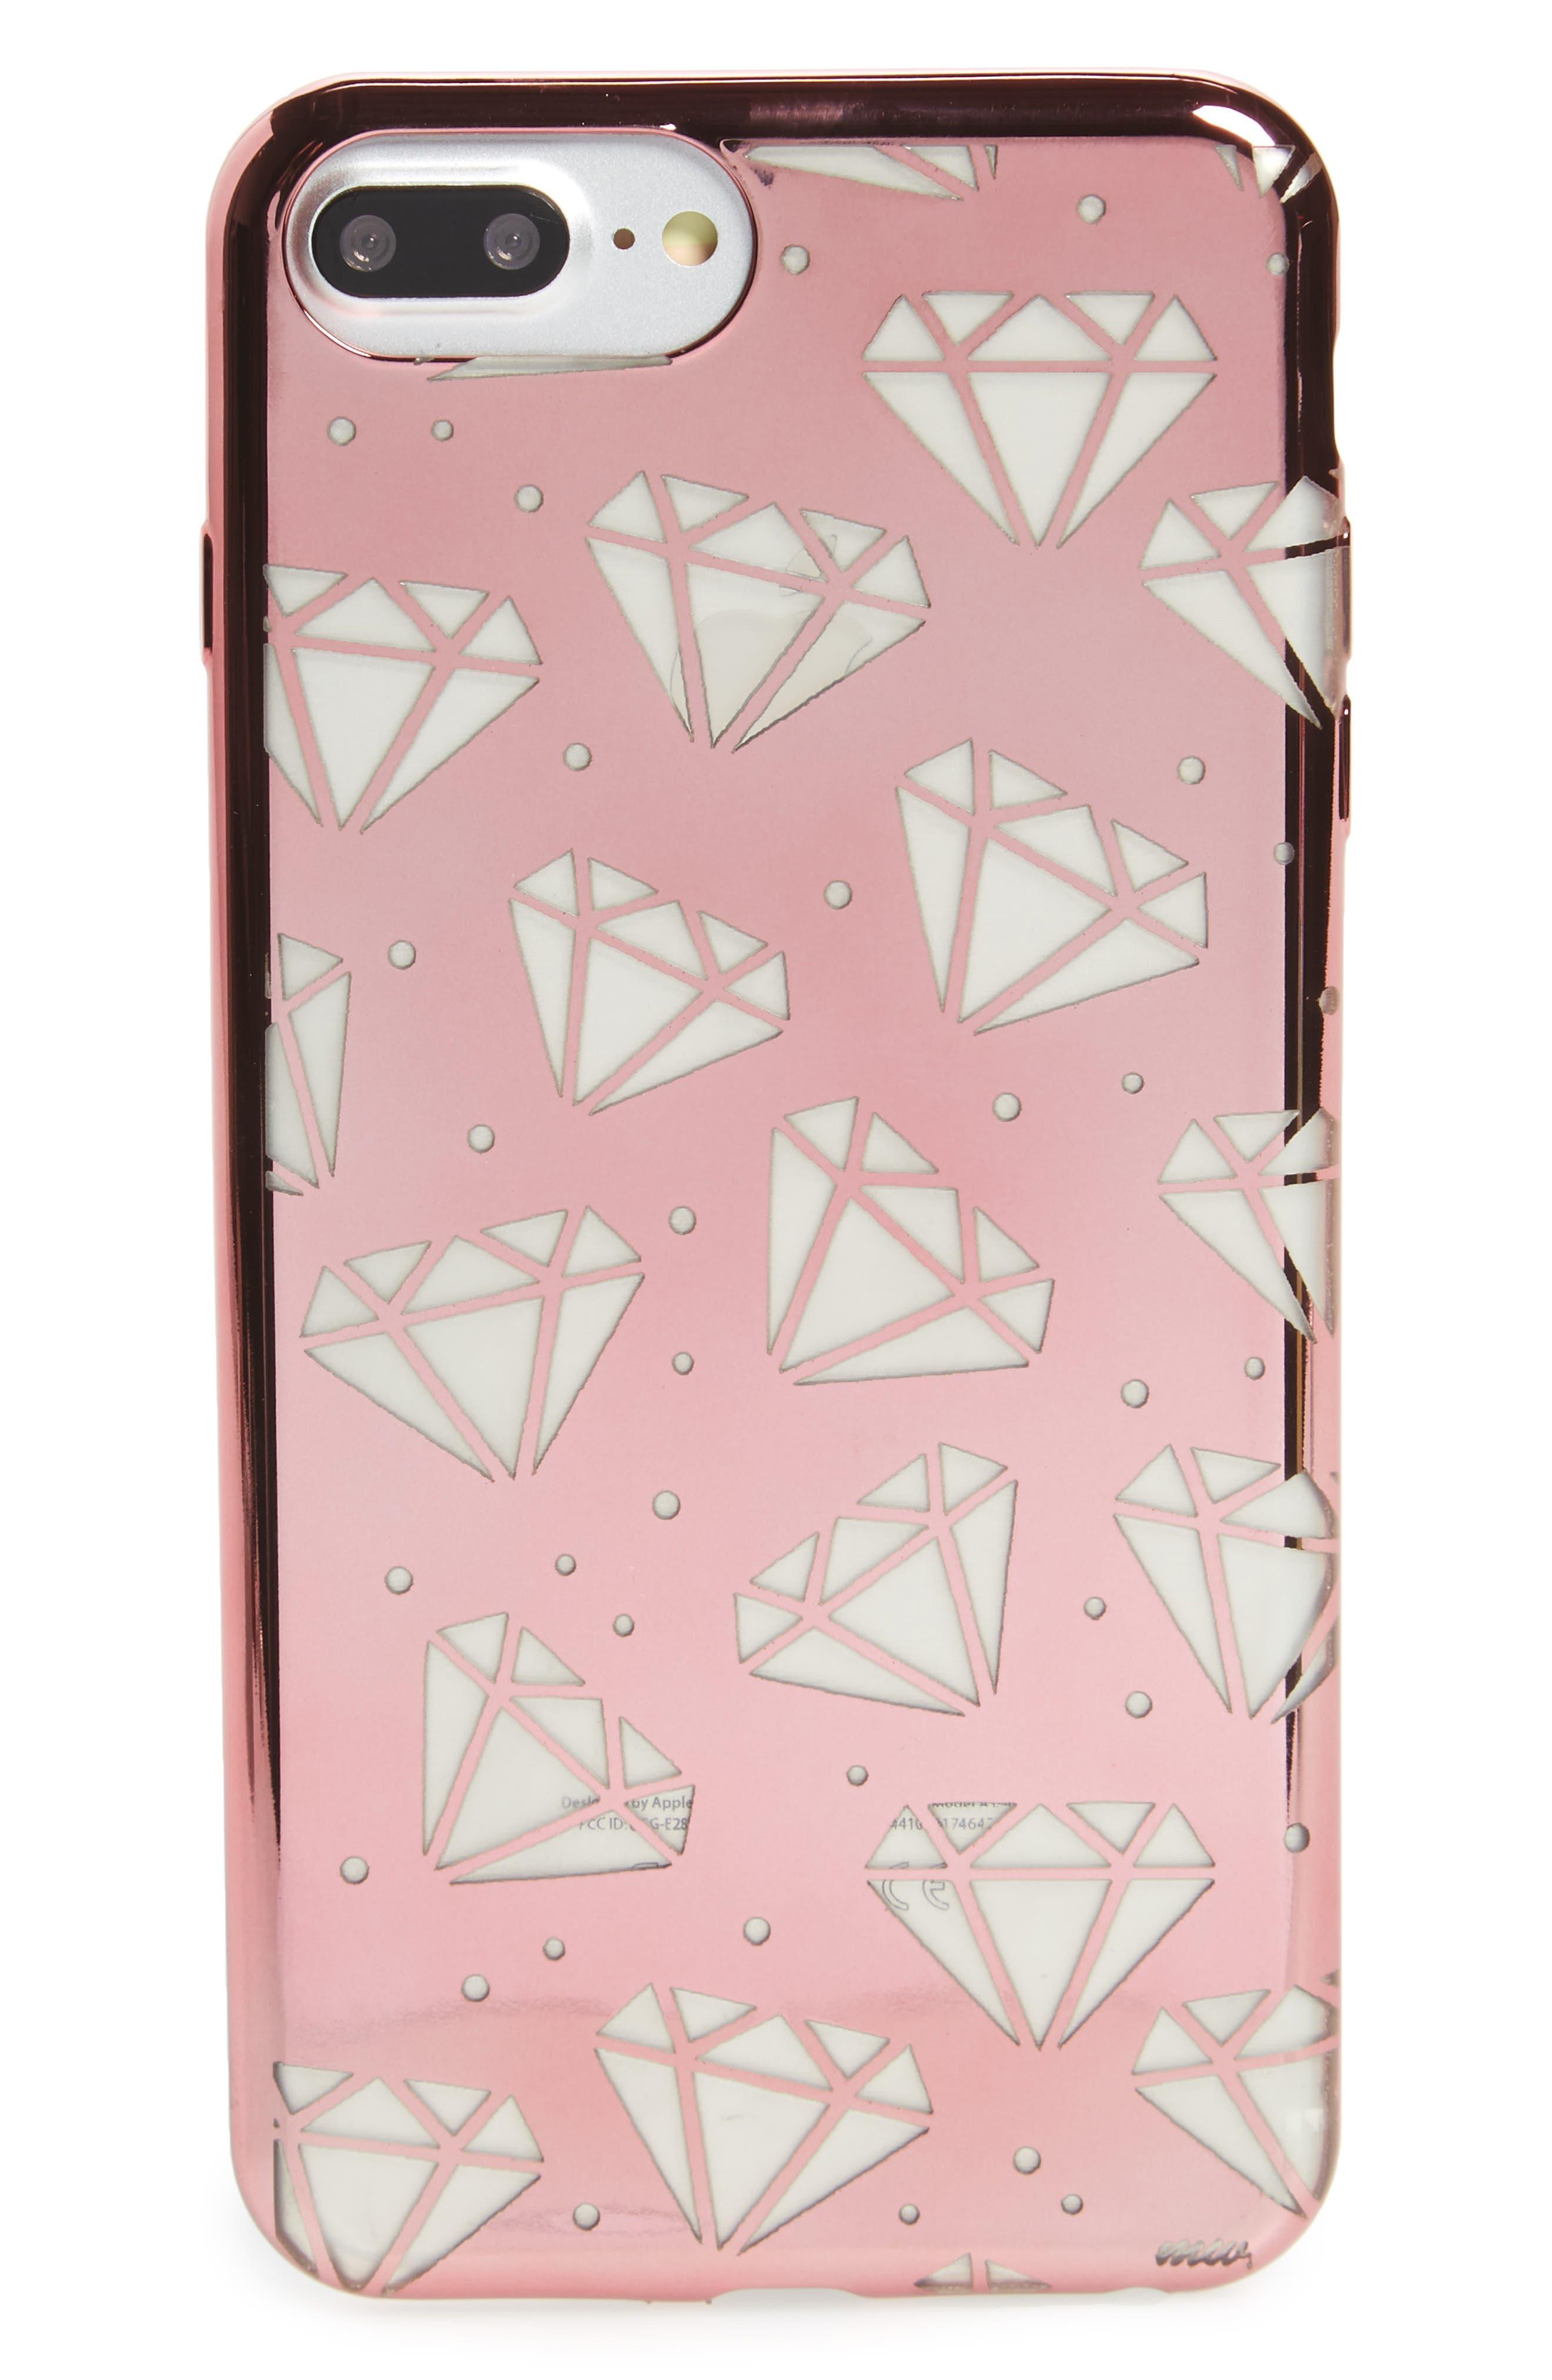 MILKYWAY Galactic Diamonds iPhone 6/6s/7 Case